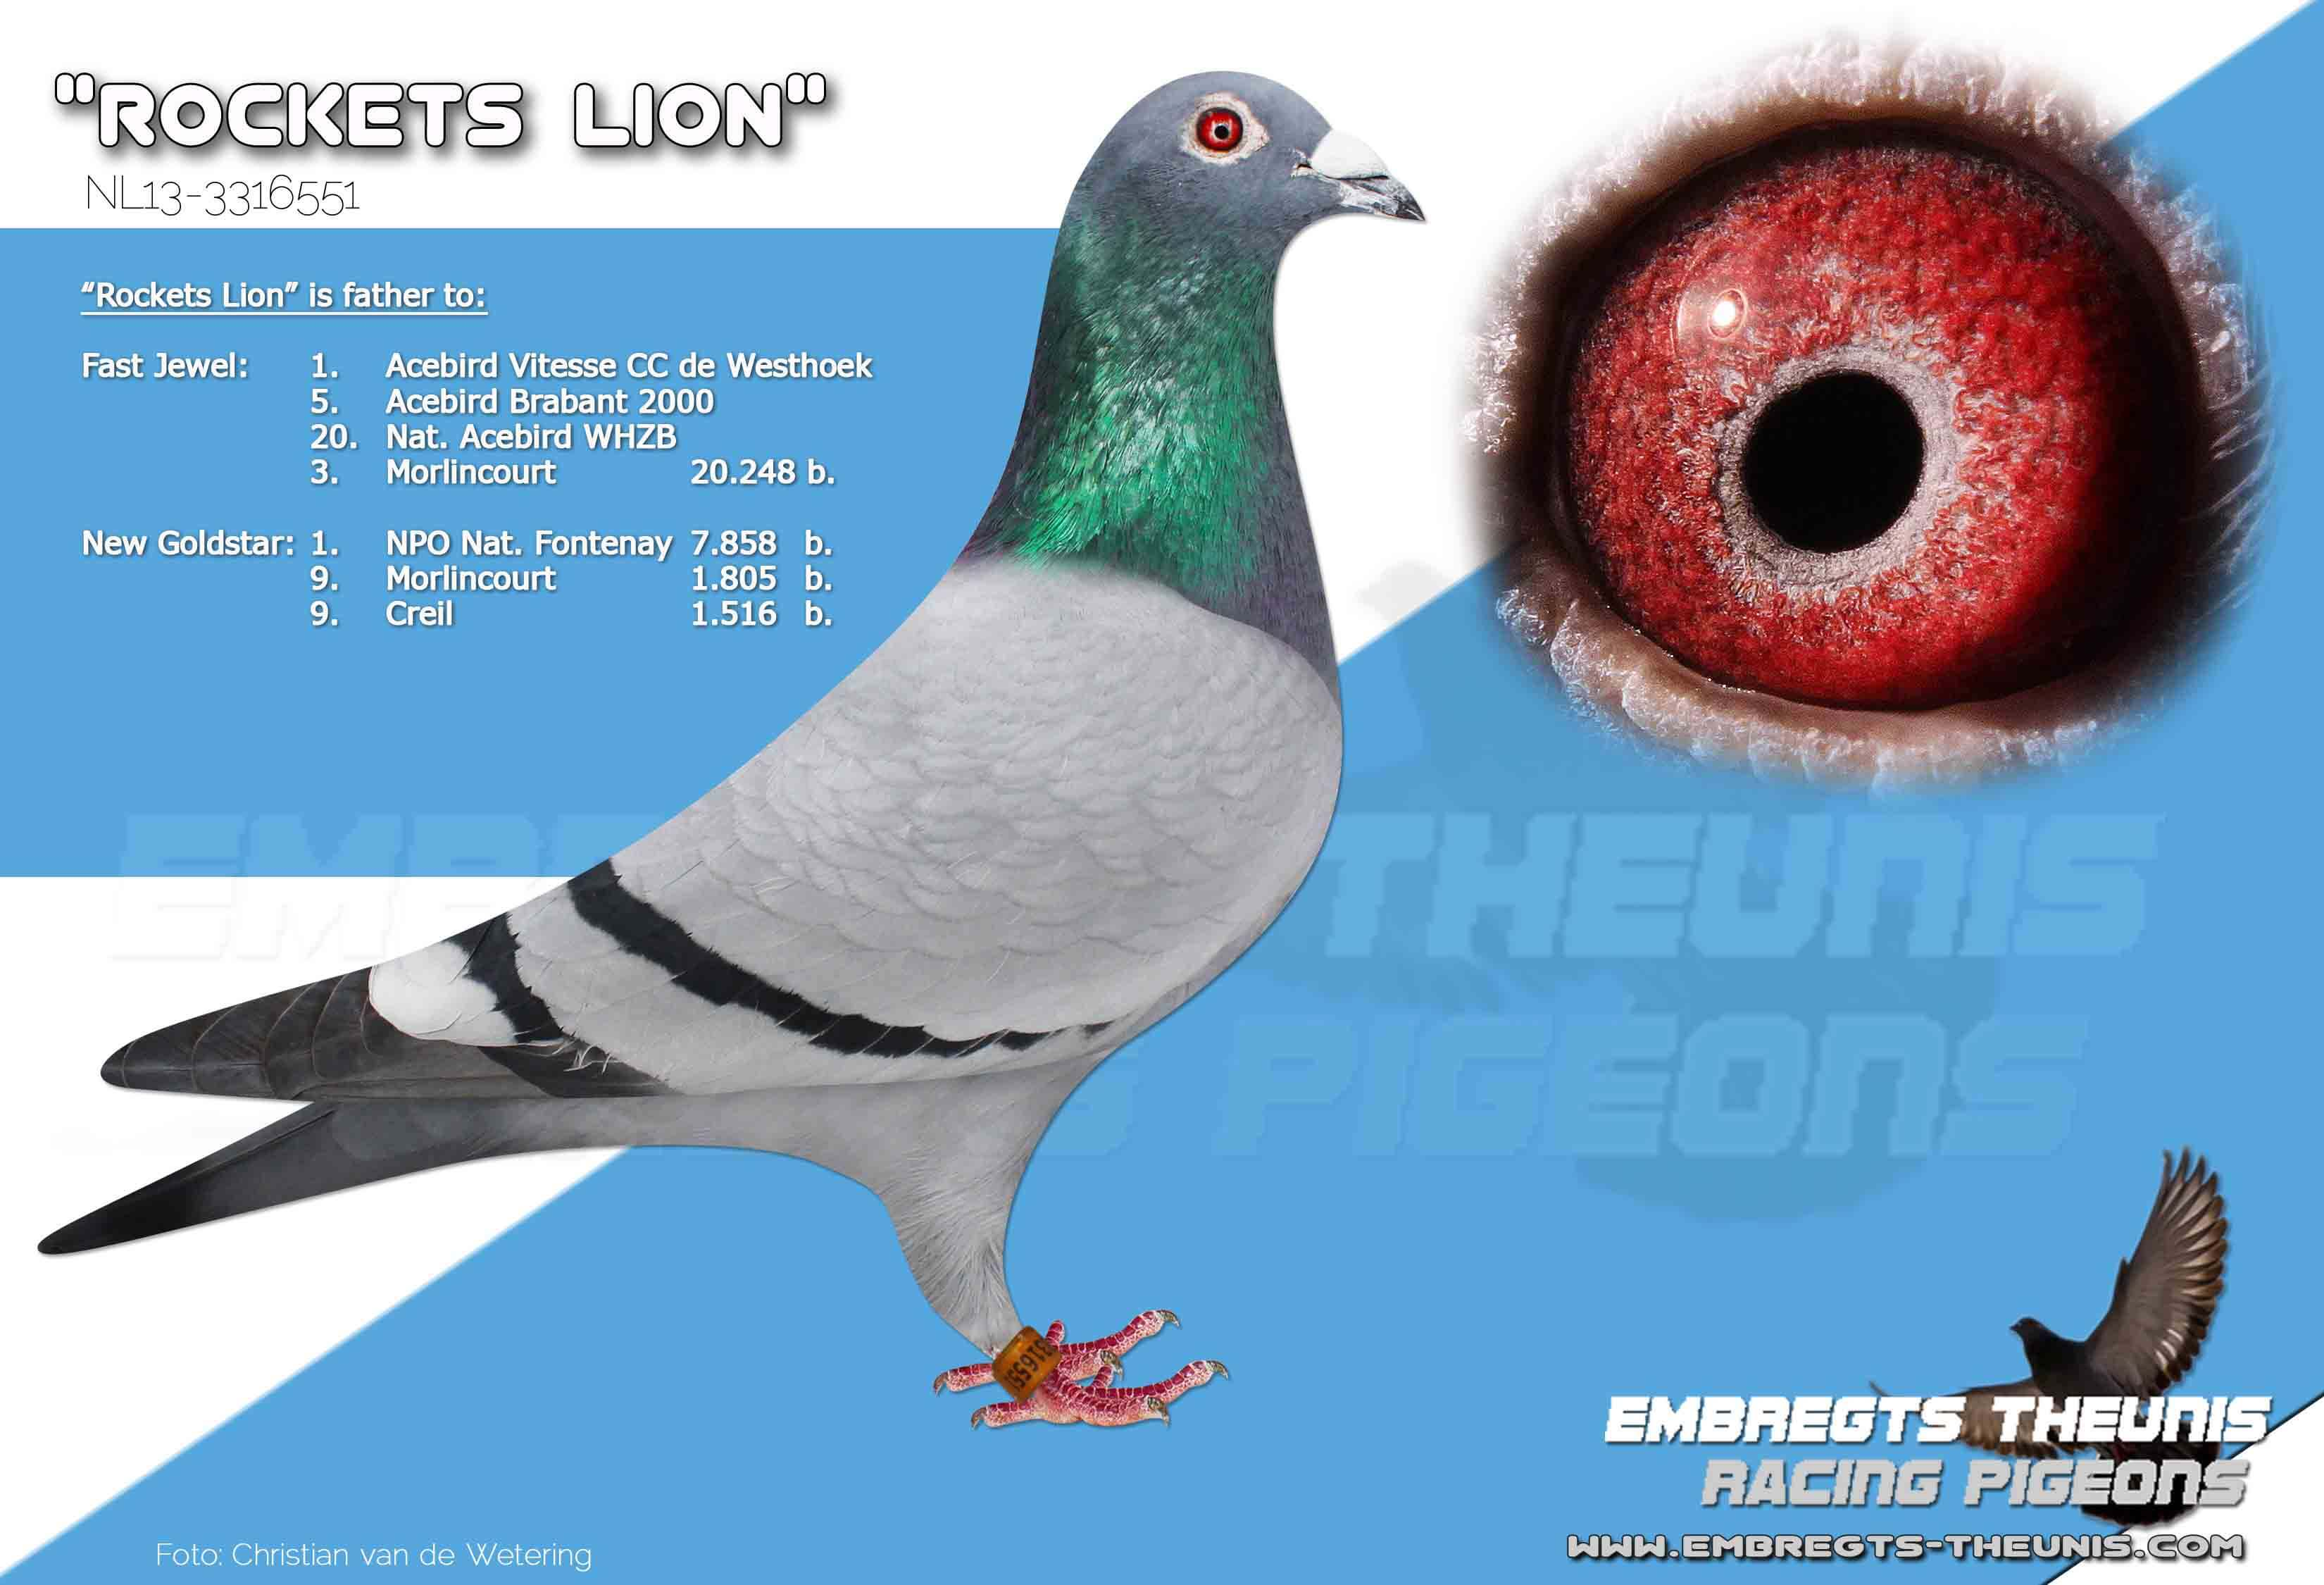 Rockets-Lion-NL13-3316551